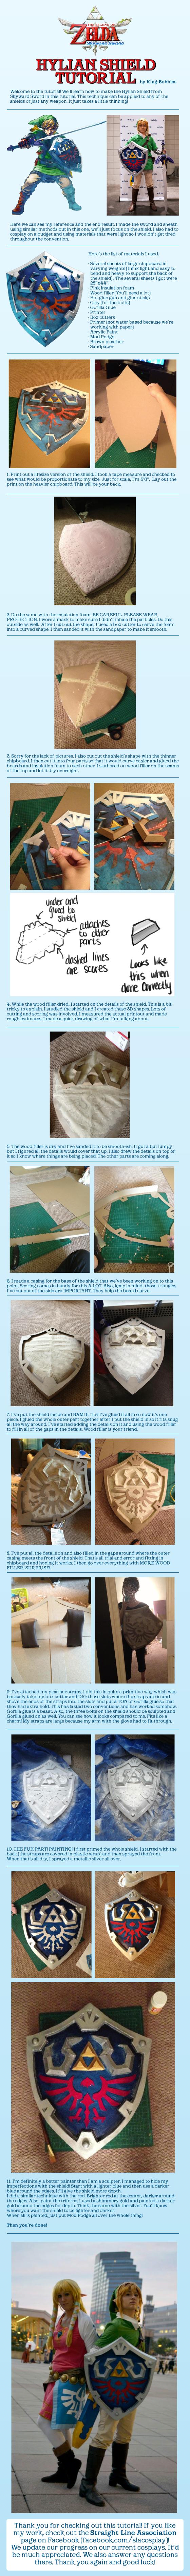 The Legend of Zelda Hylian Shield Cosplay Tutorial by King-Bobbles